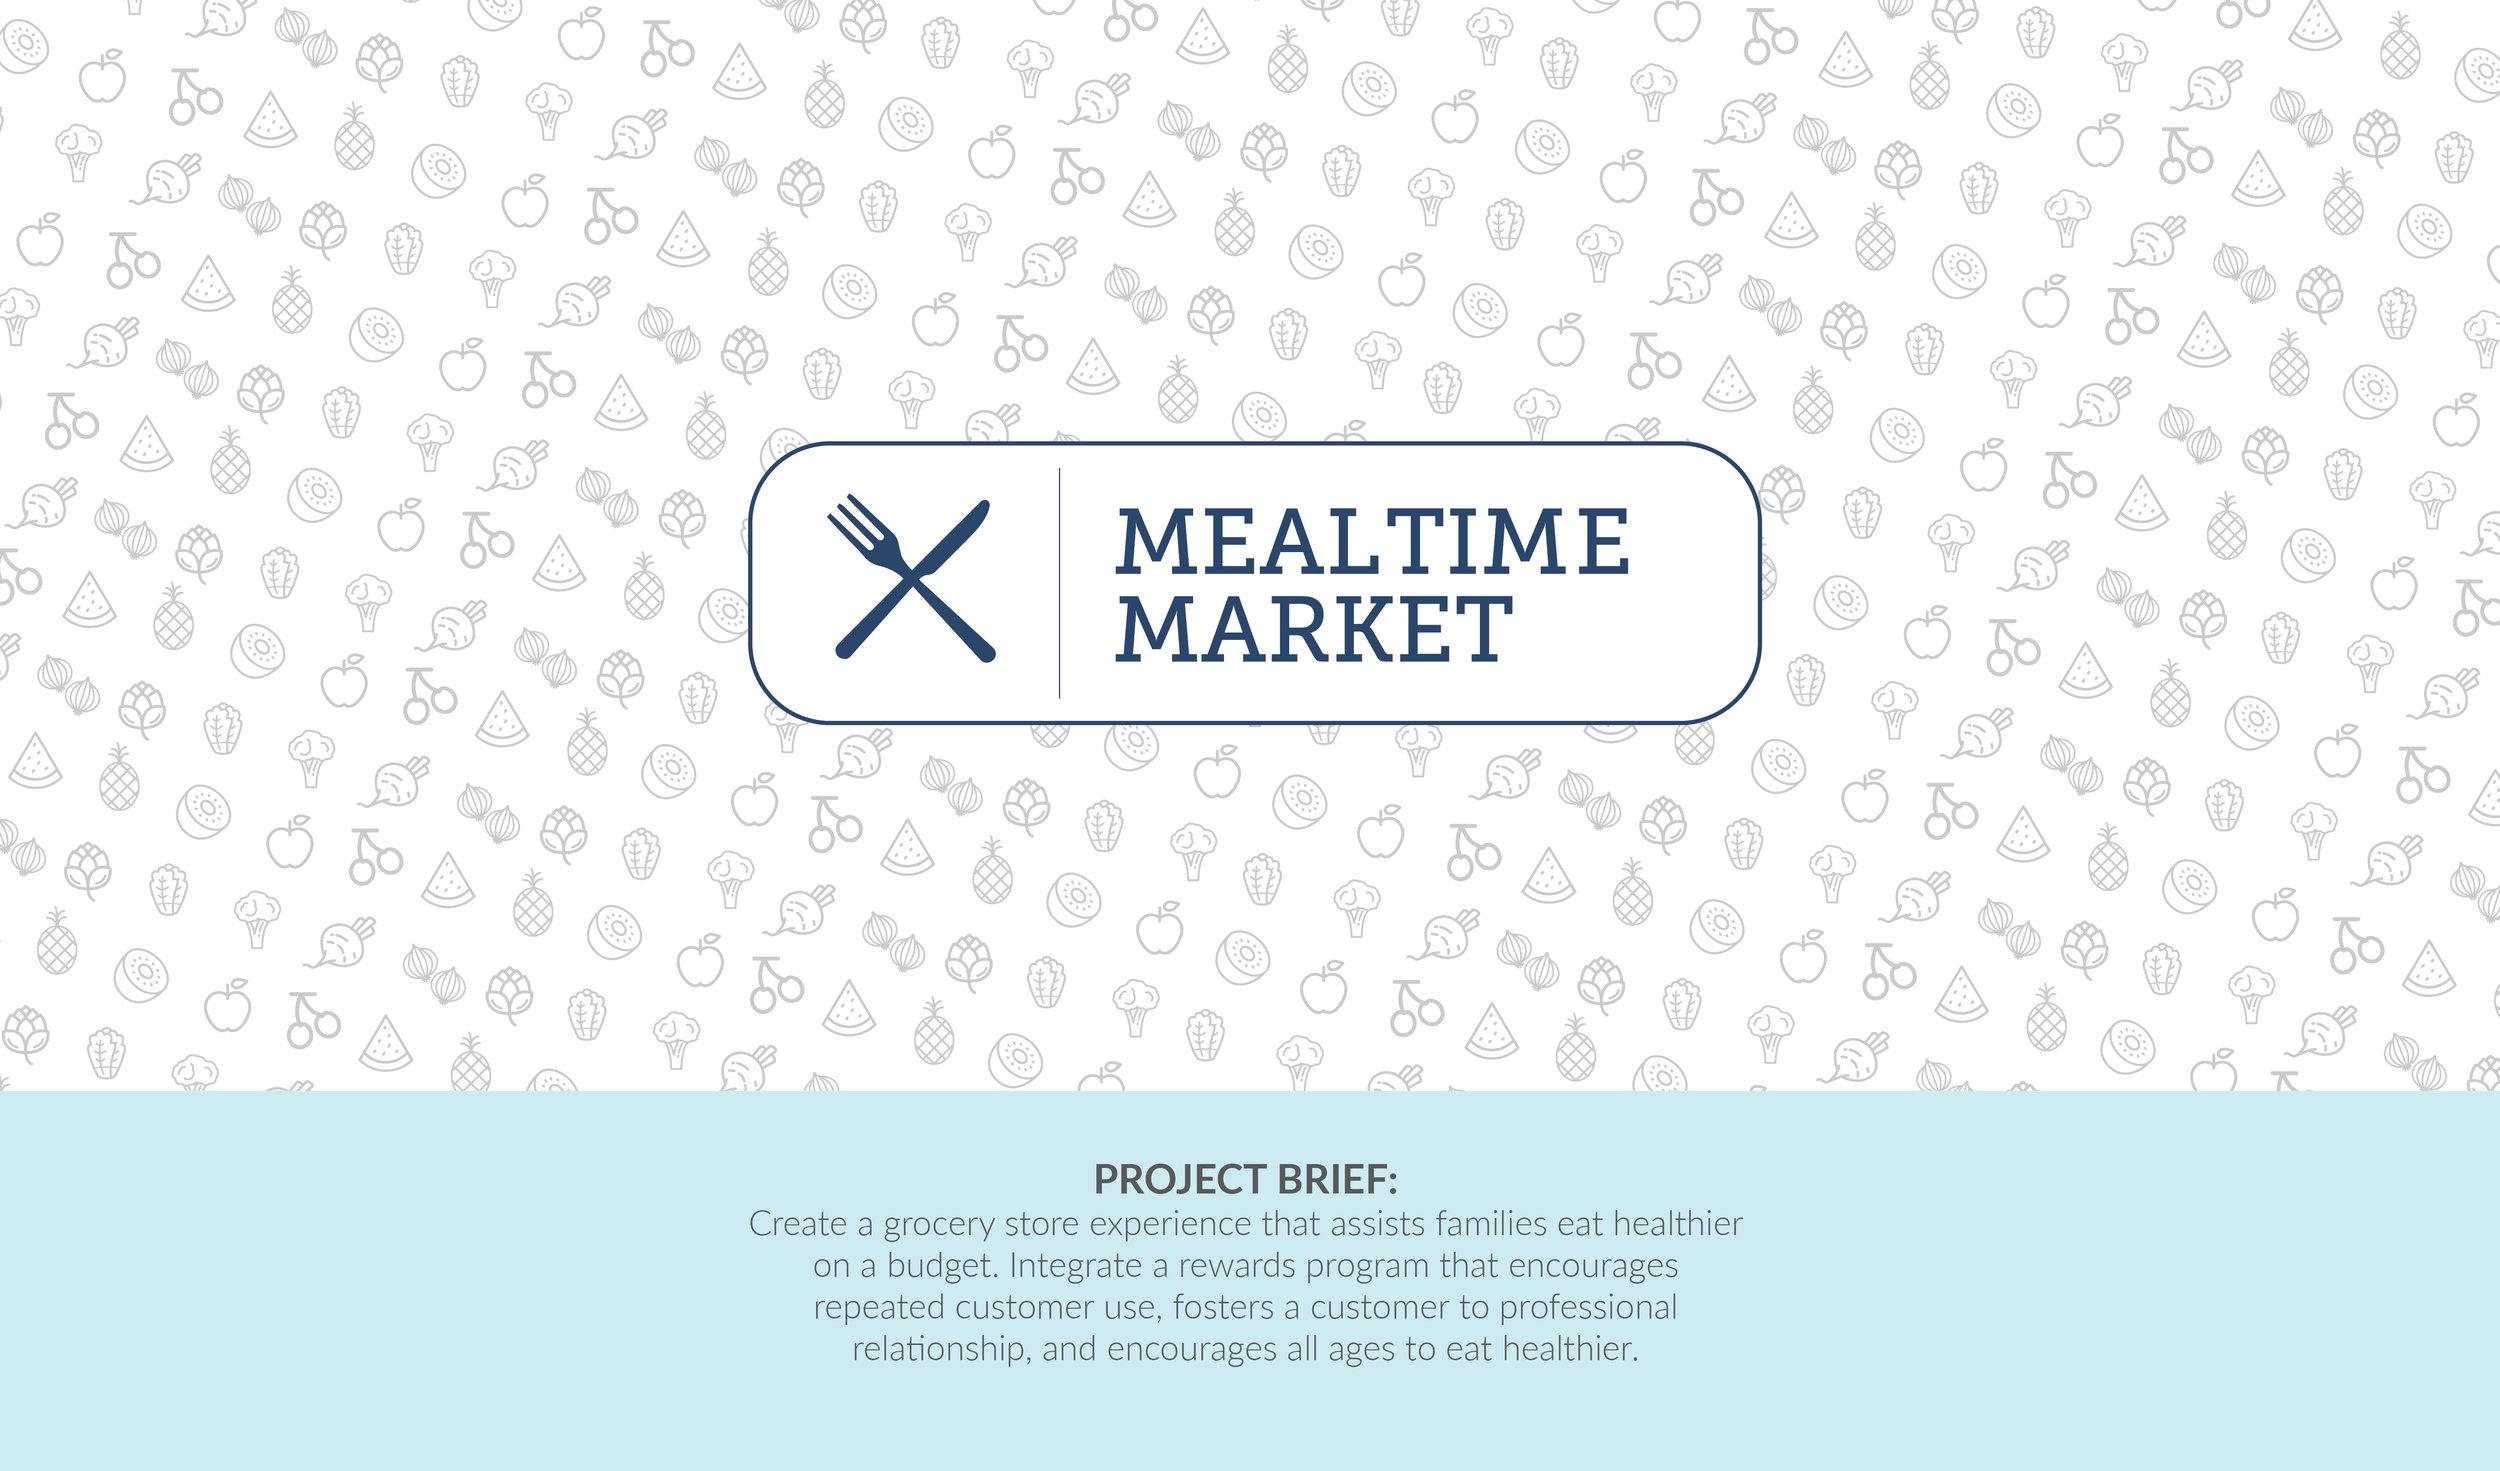 McInturf_Mealtime Market_Process Book.jpg